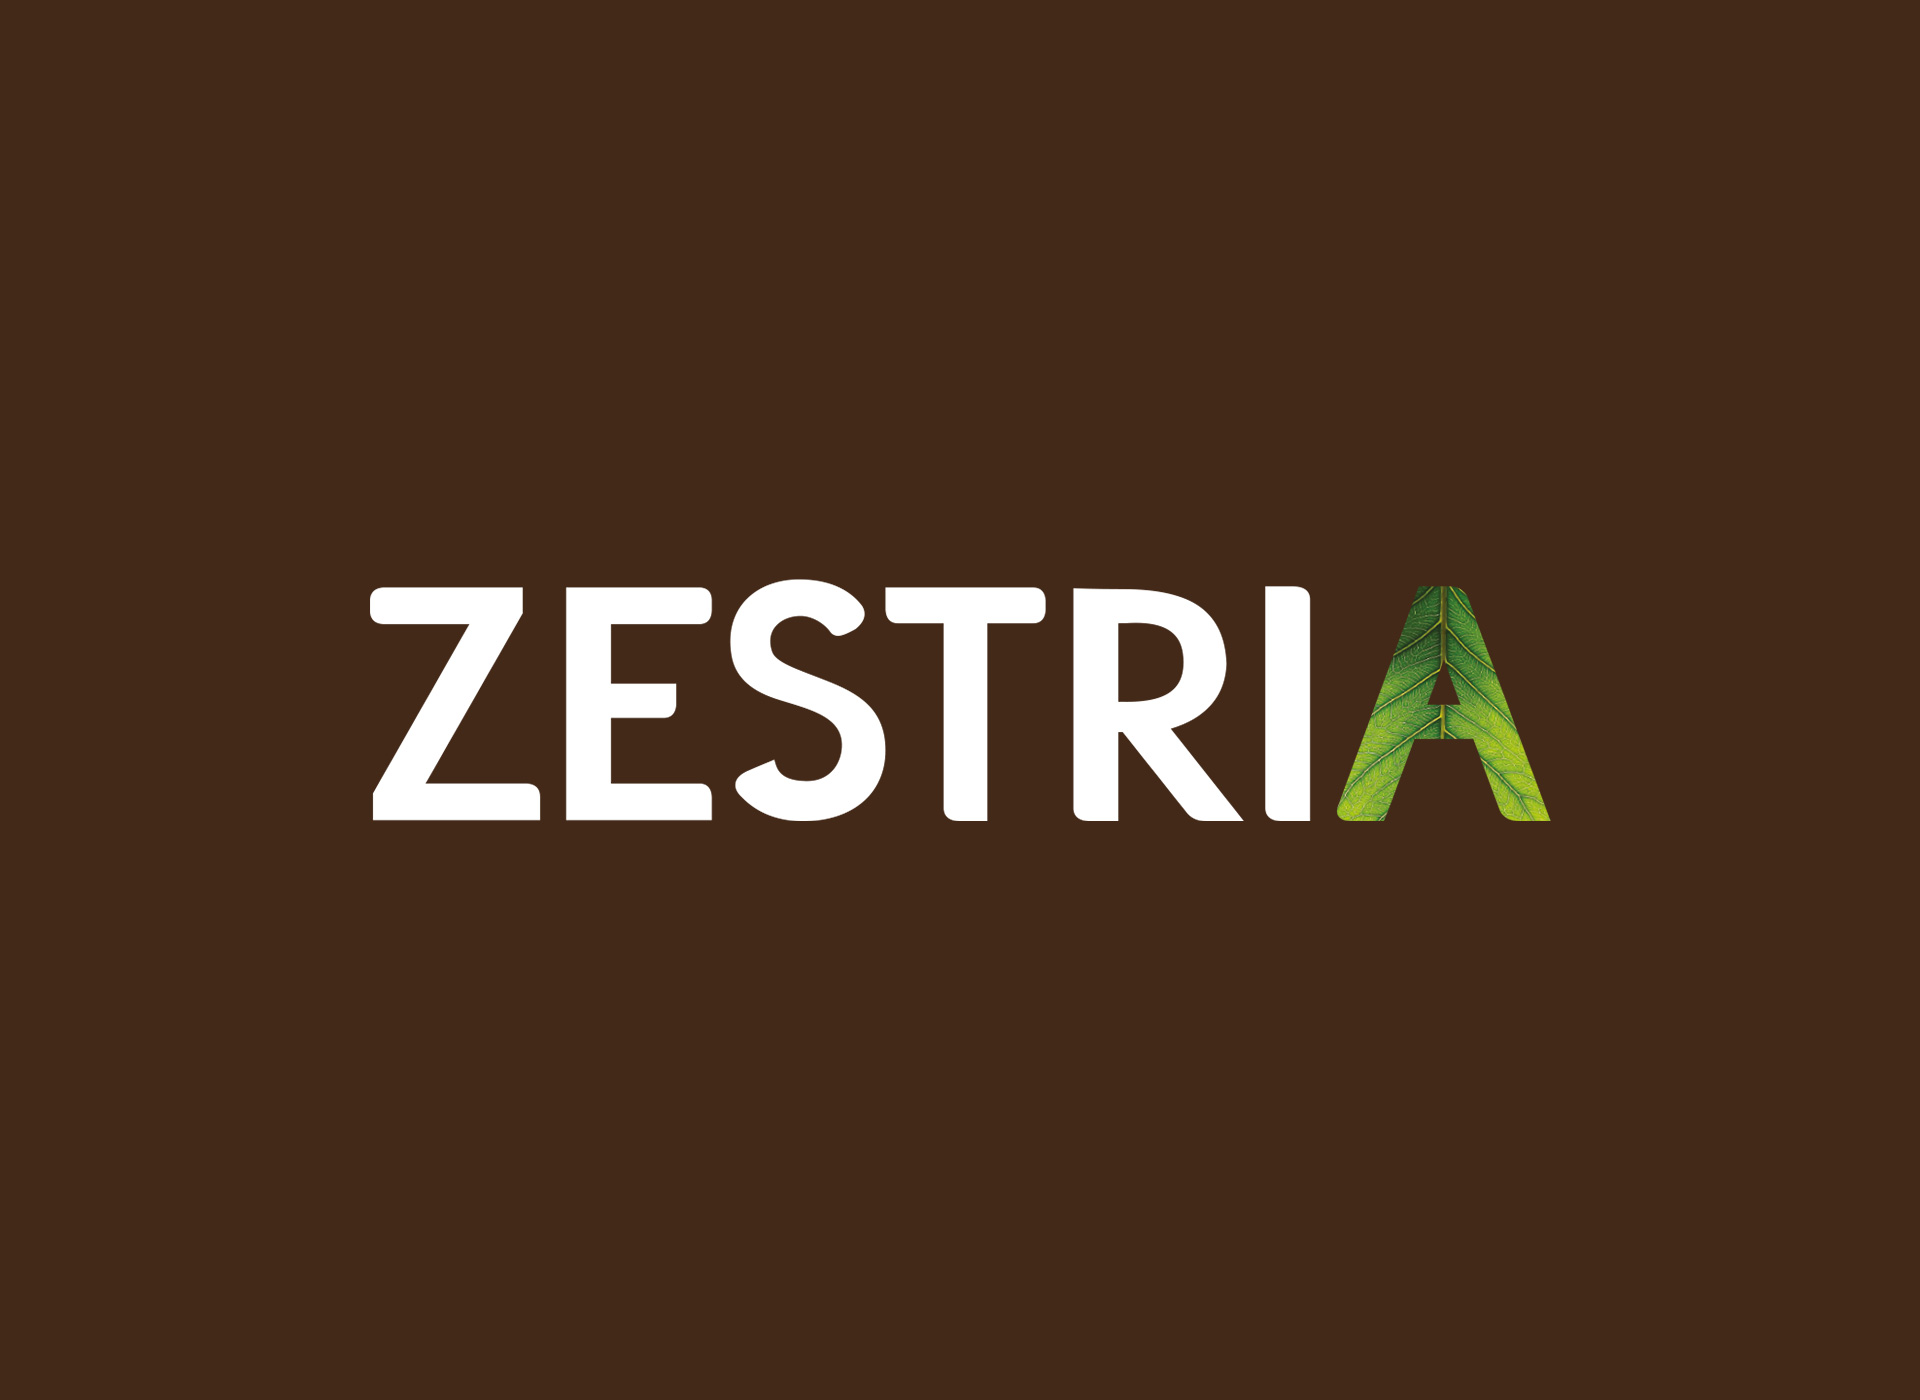 Zestria